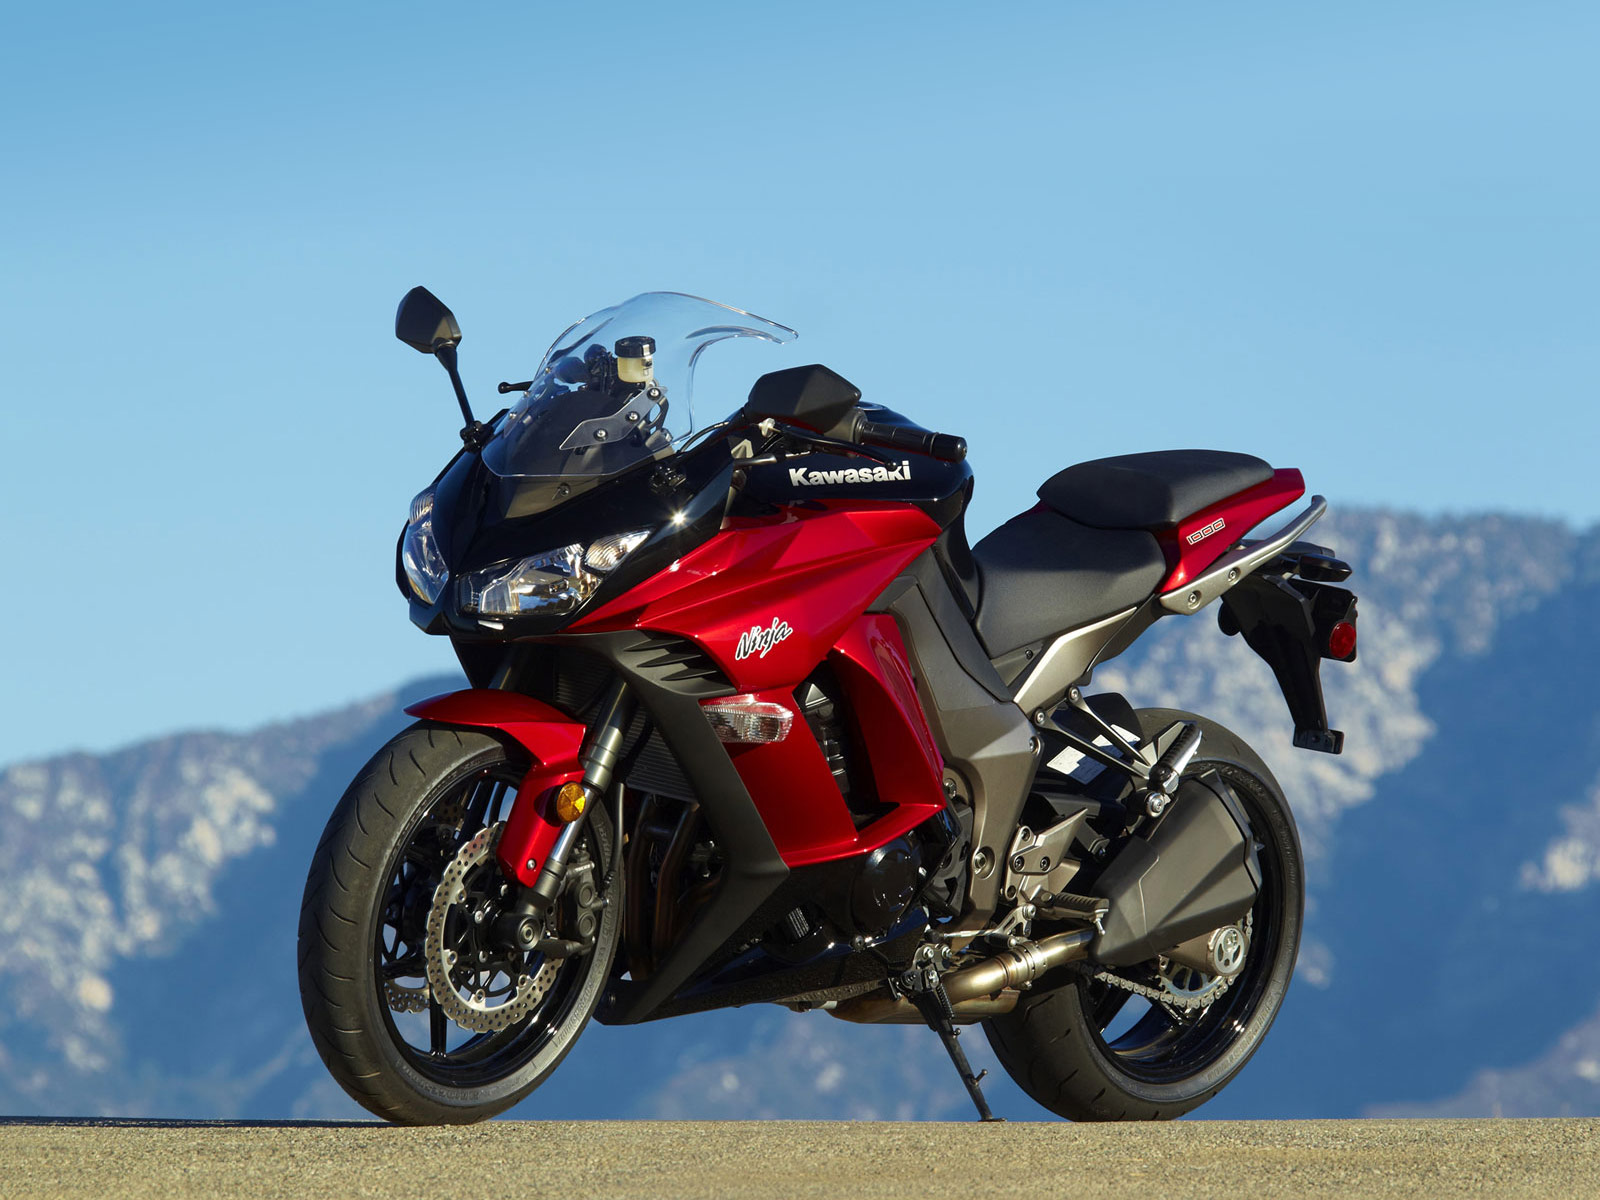 Motorcycle Big Bike Kawasaki Ninja 1000 2011